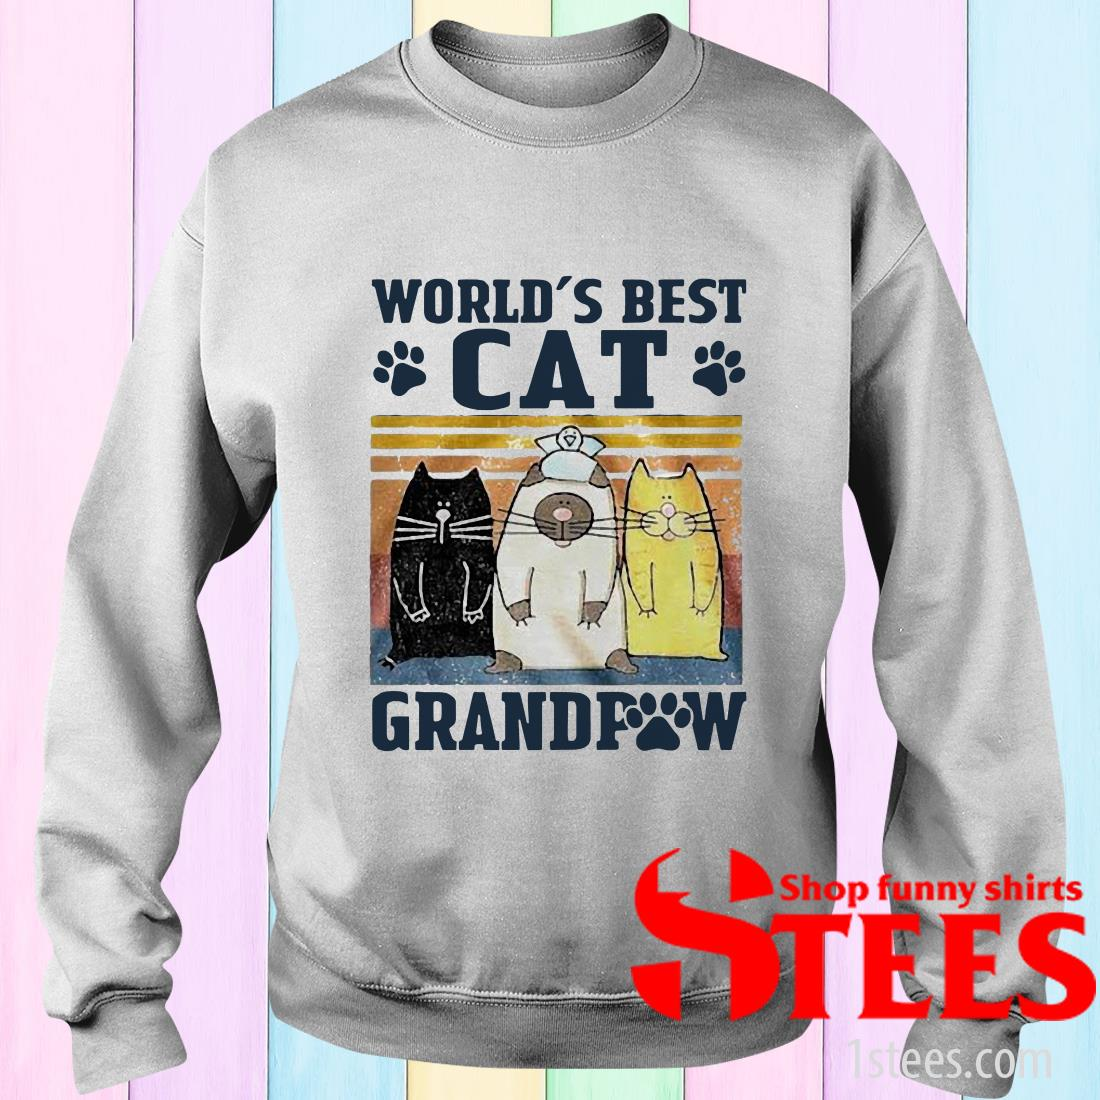 World's Best Cat Grandpaw Vintage Sweater